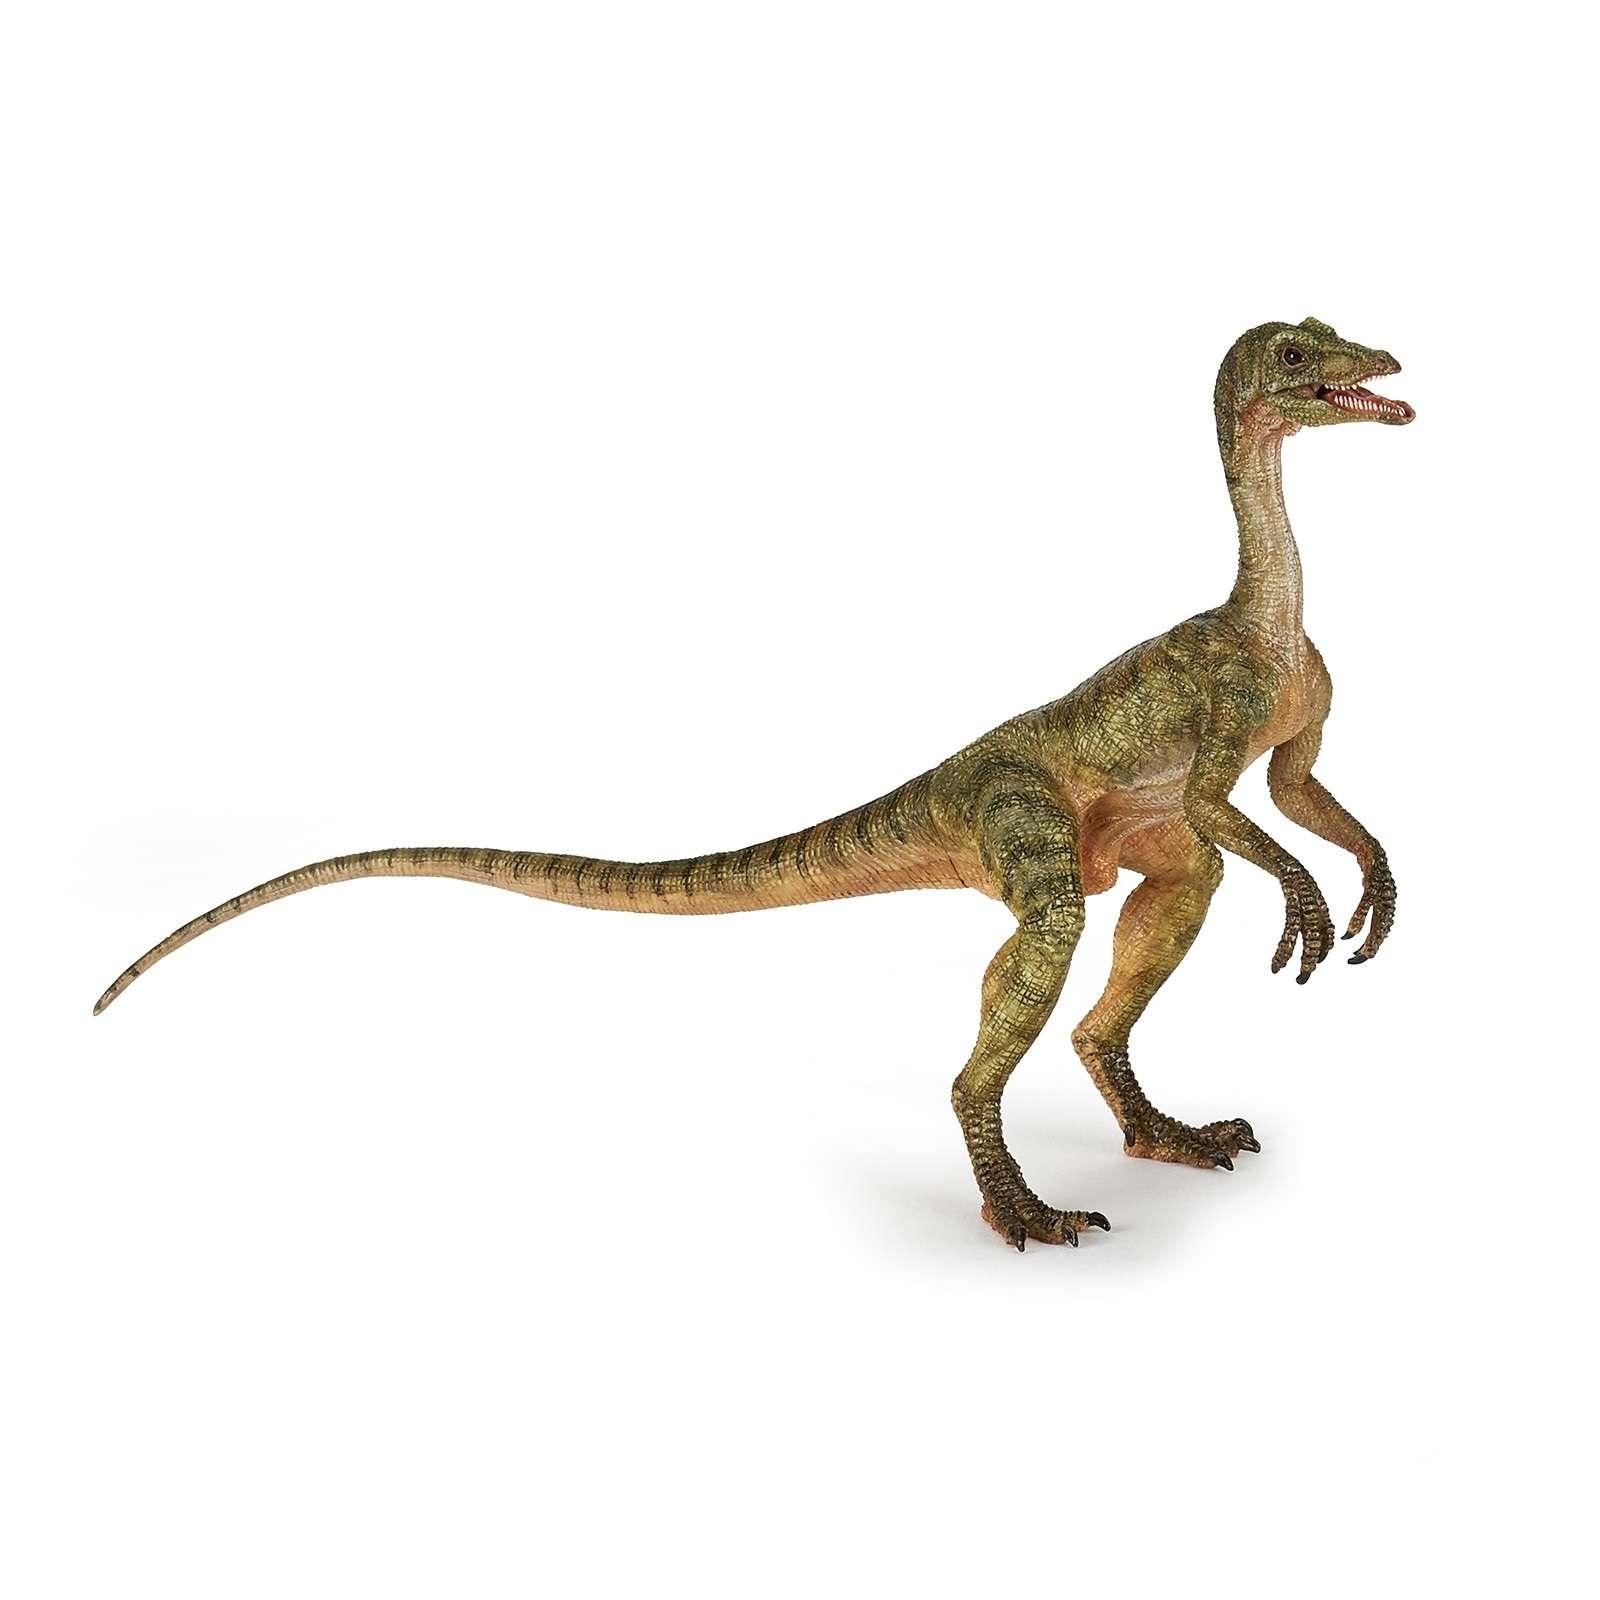 Animal Figure: Dinosaur - Compsognathus, 55072 Photo